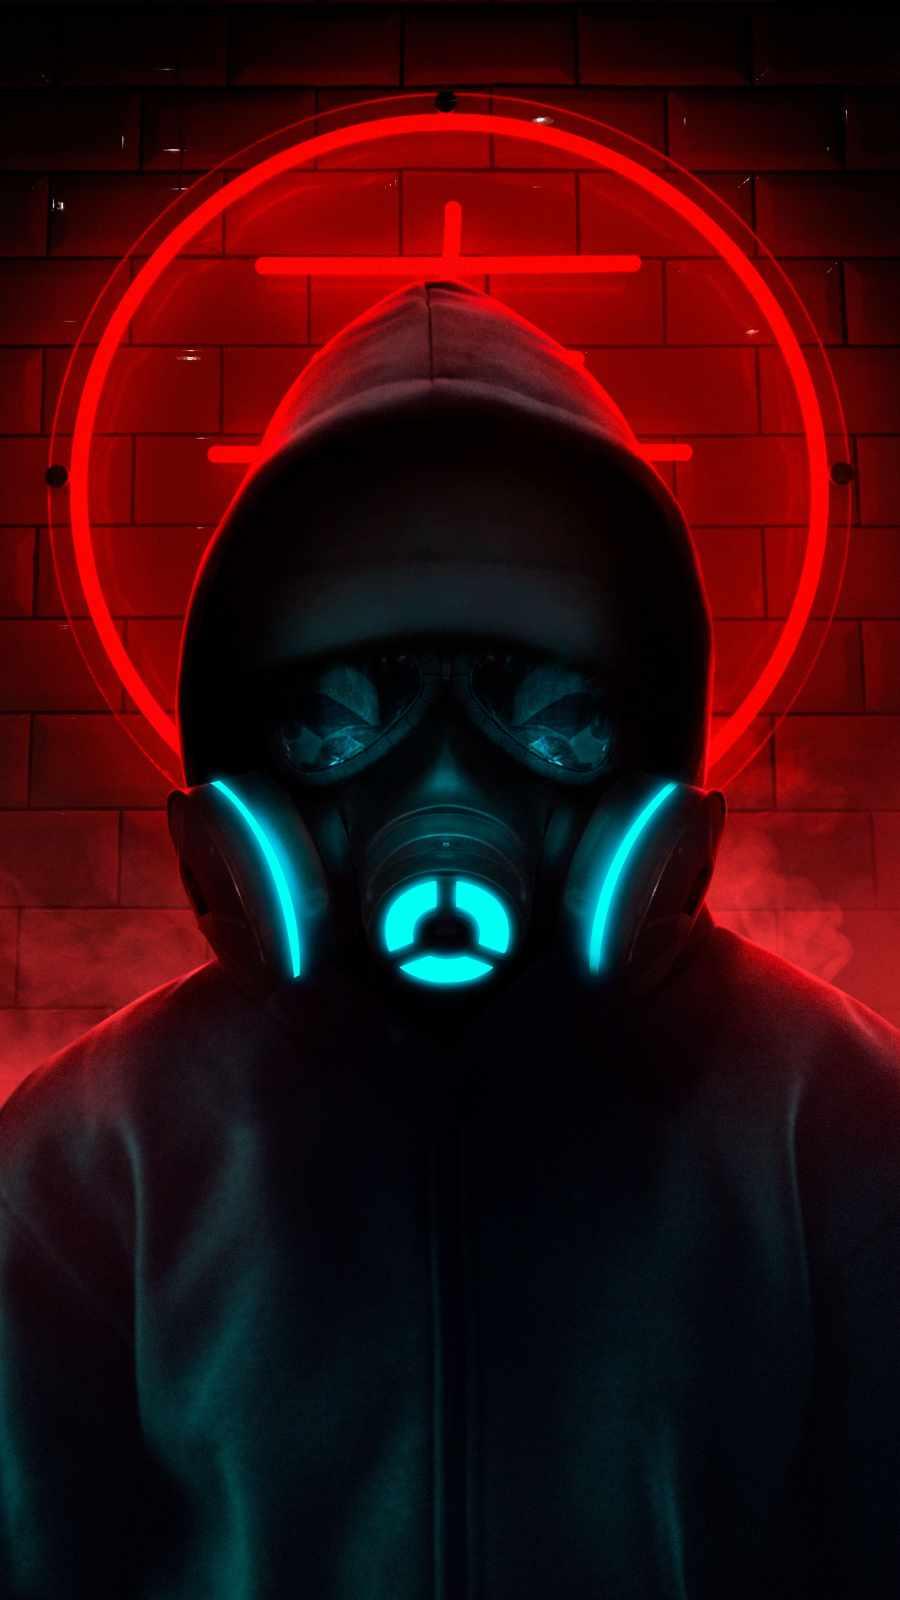 Gas Mask Neon Hoodie Guy